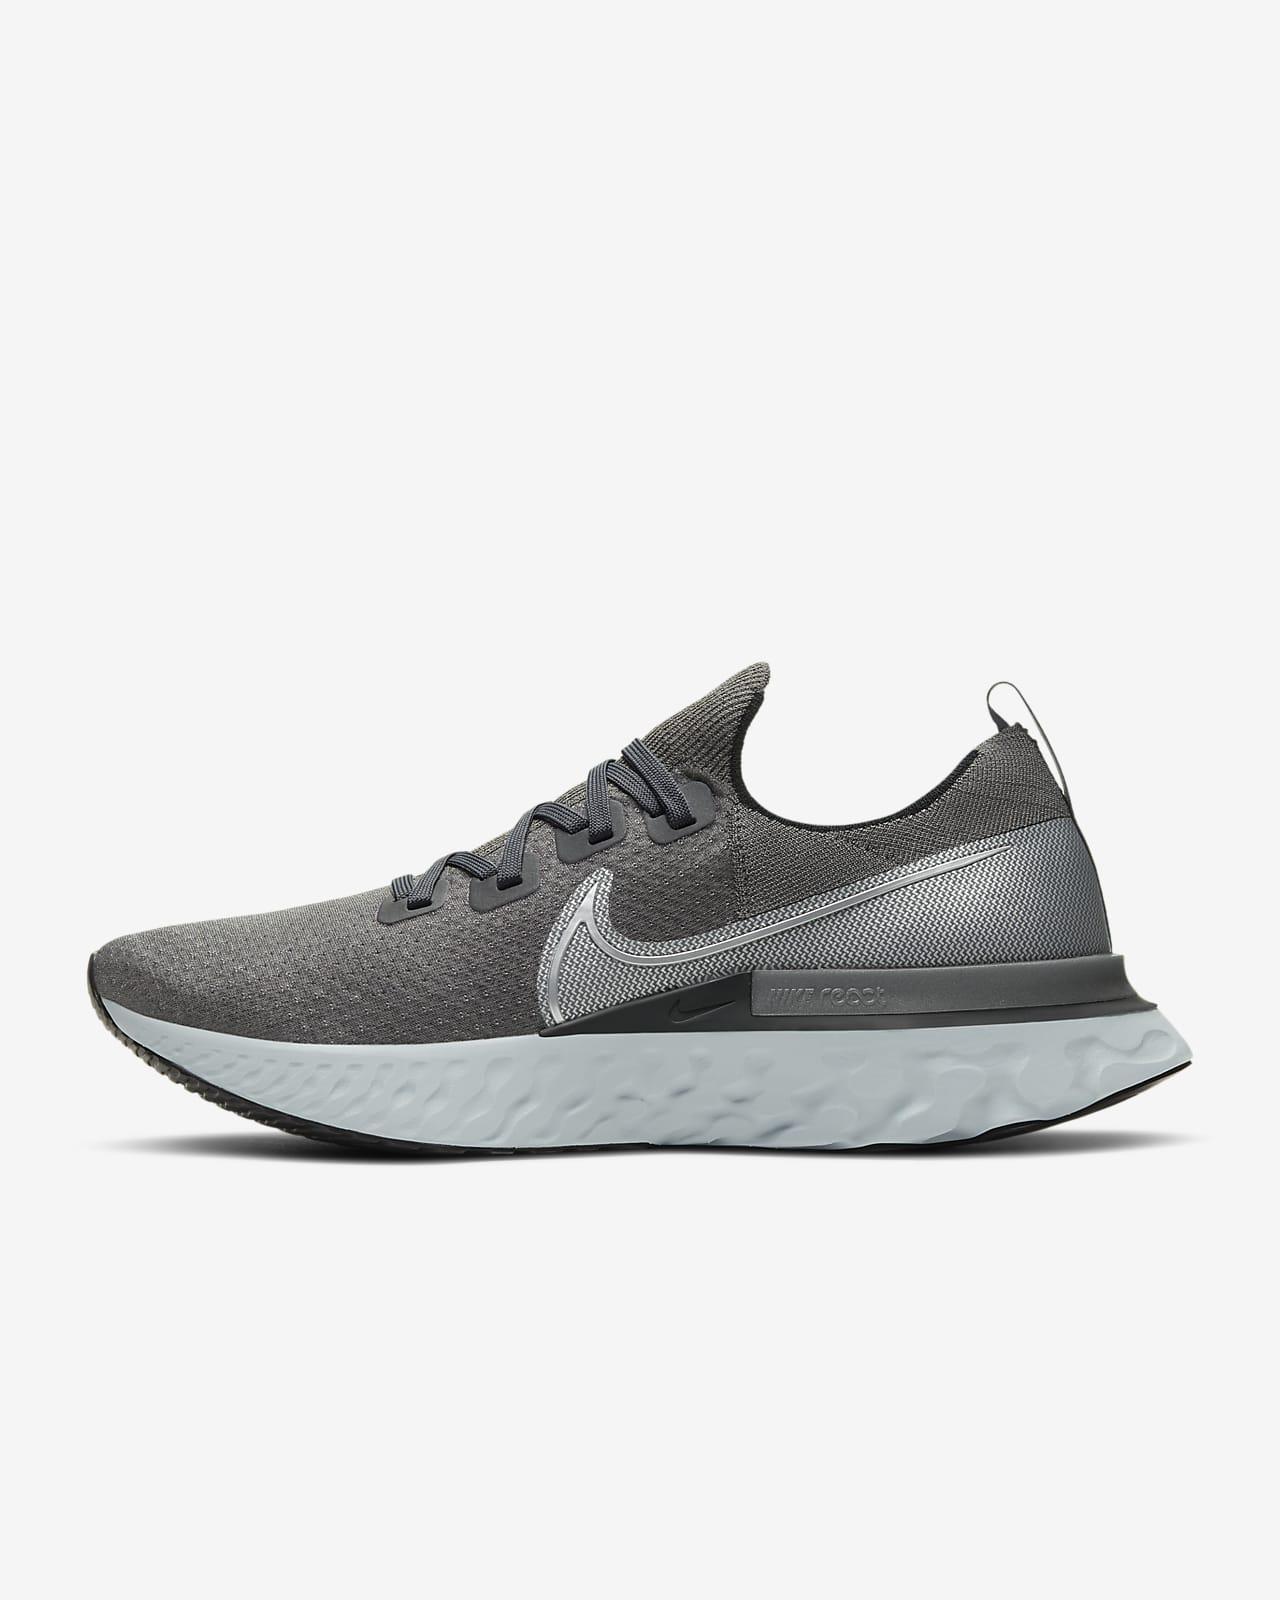 Nike React Infinity Run Flyknit Zapatillas de running - Hombre